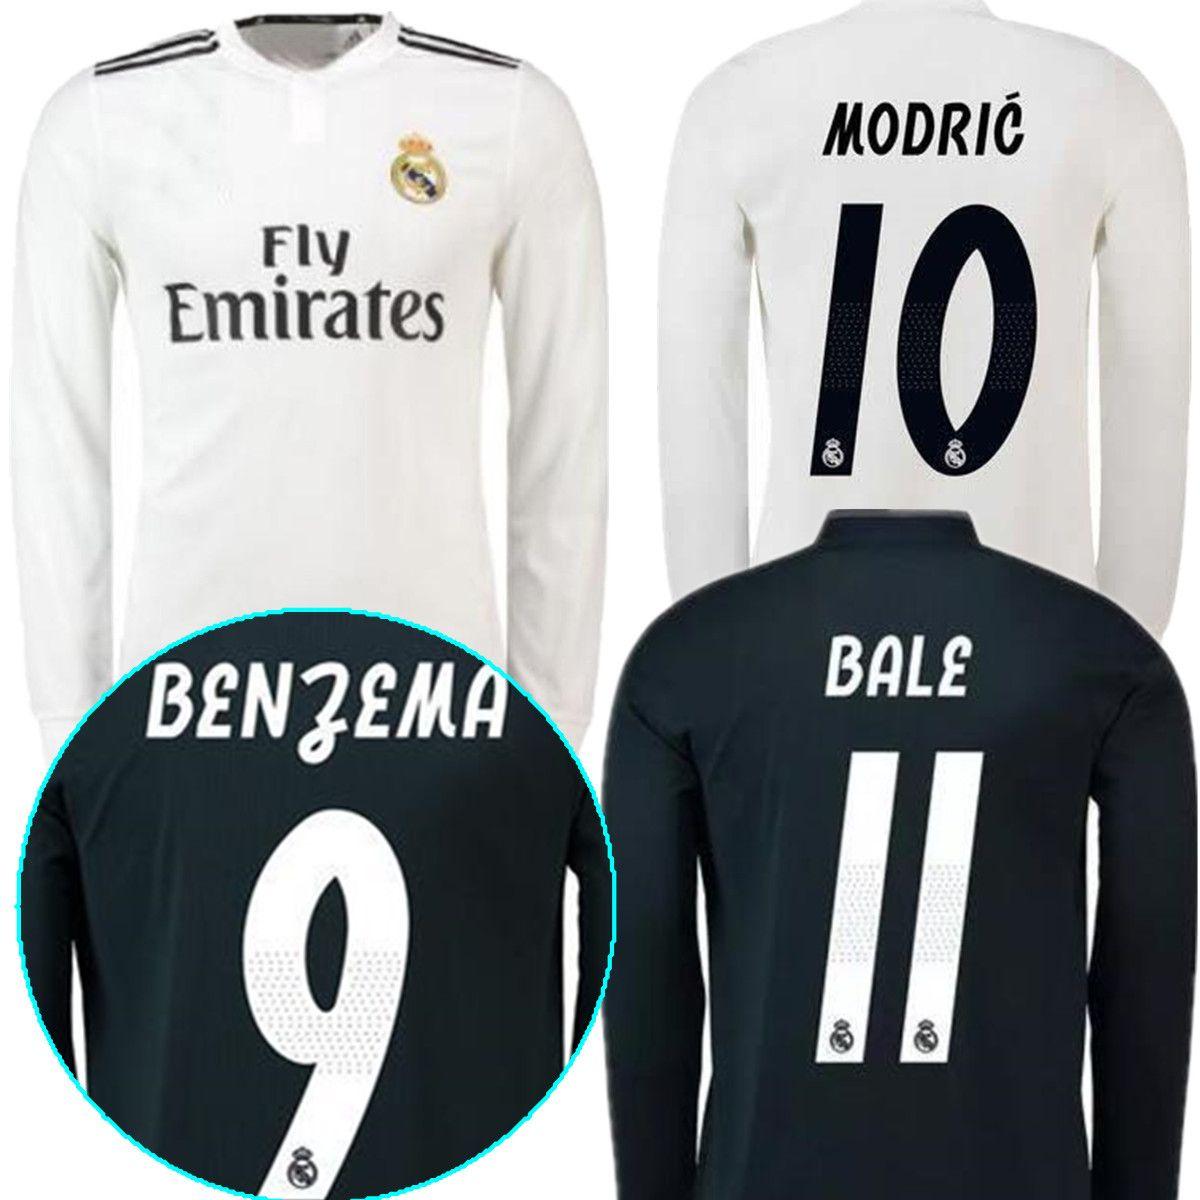 18 19 Real Madrid Camiseta De Manga Larga RONALDO Soccer Jersey 2019 Blanco  RAMOS KROOS ISCO ASENSIO MODRIC MARCELO BALE BENZEMA Camisetas De Fútbol  Por ... 3dc0b2ac5d19d